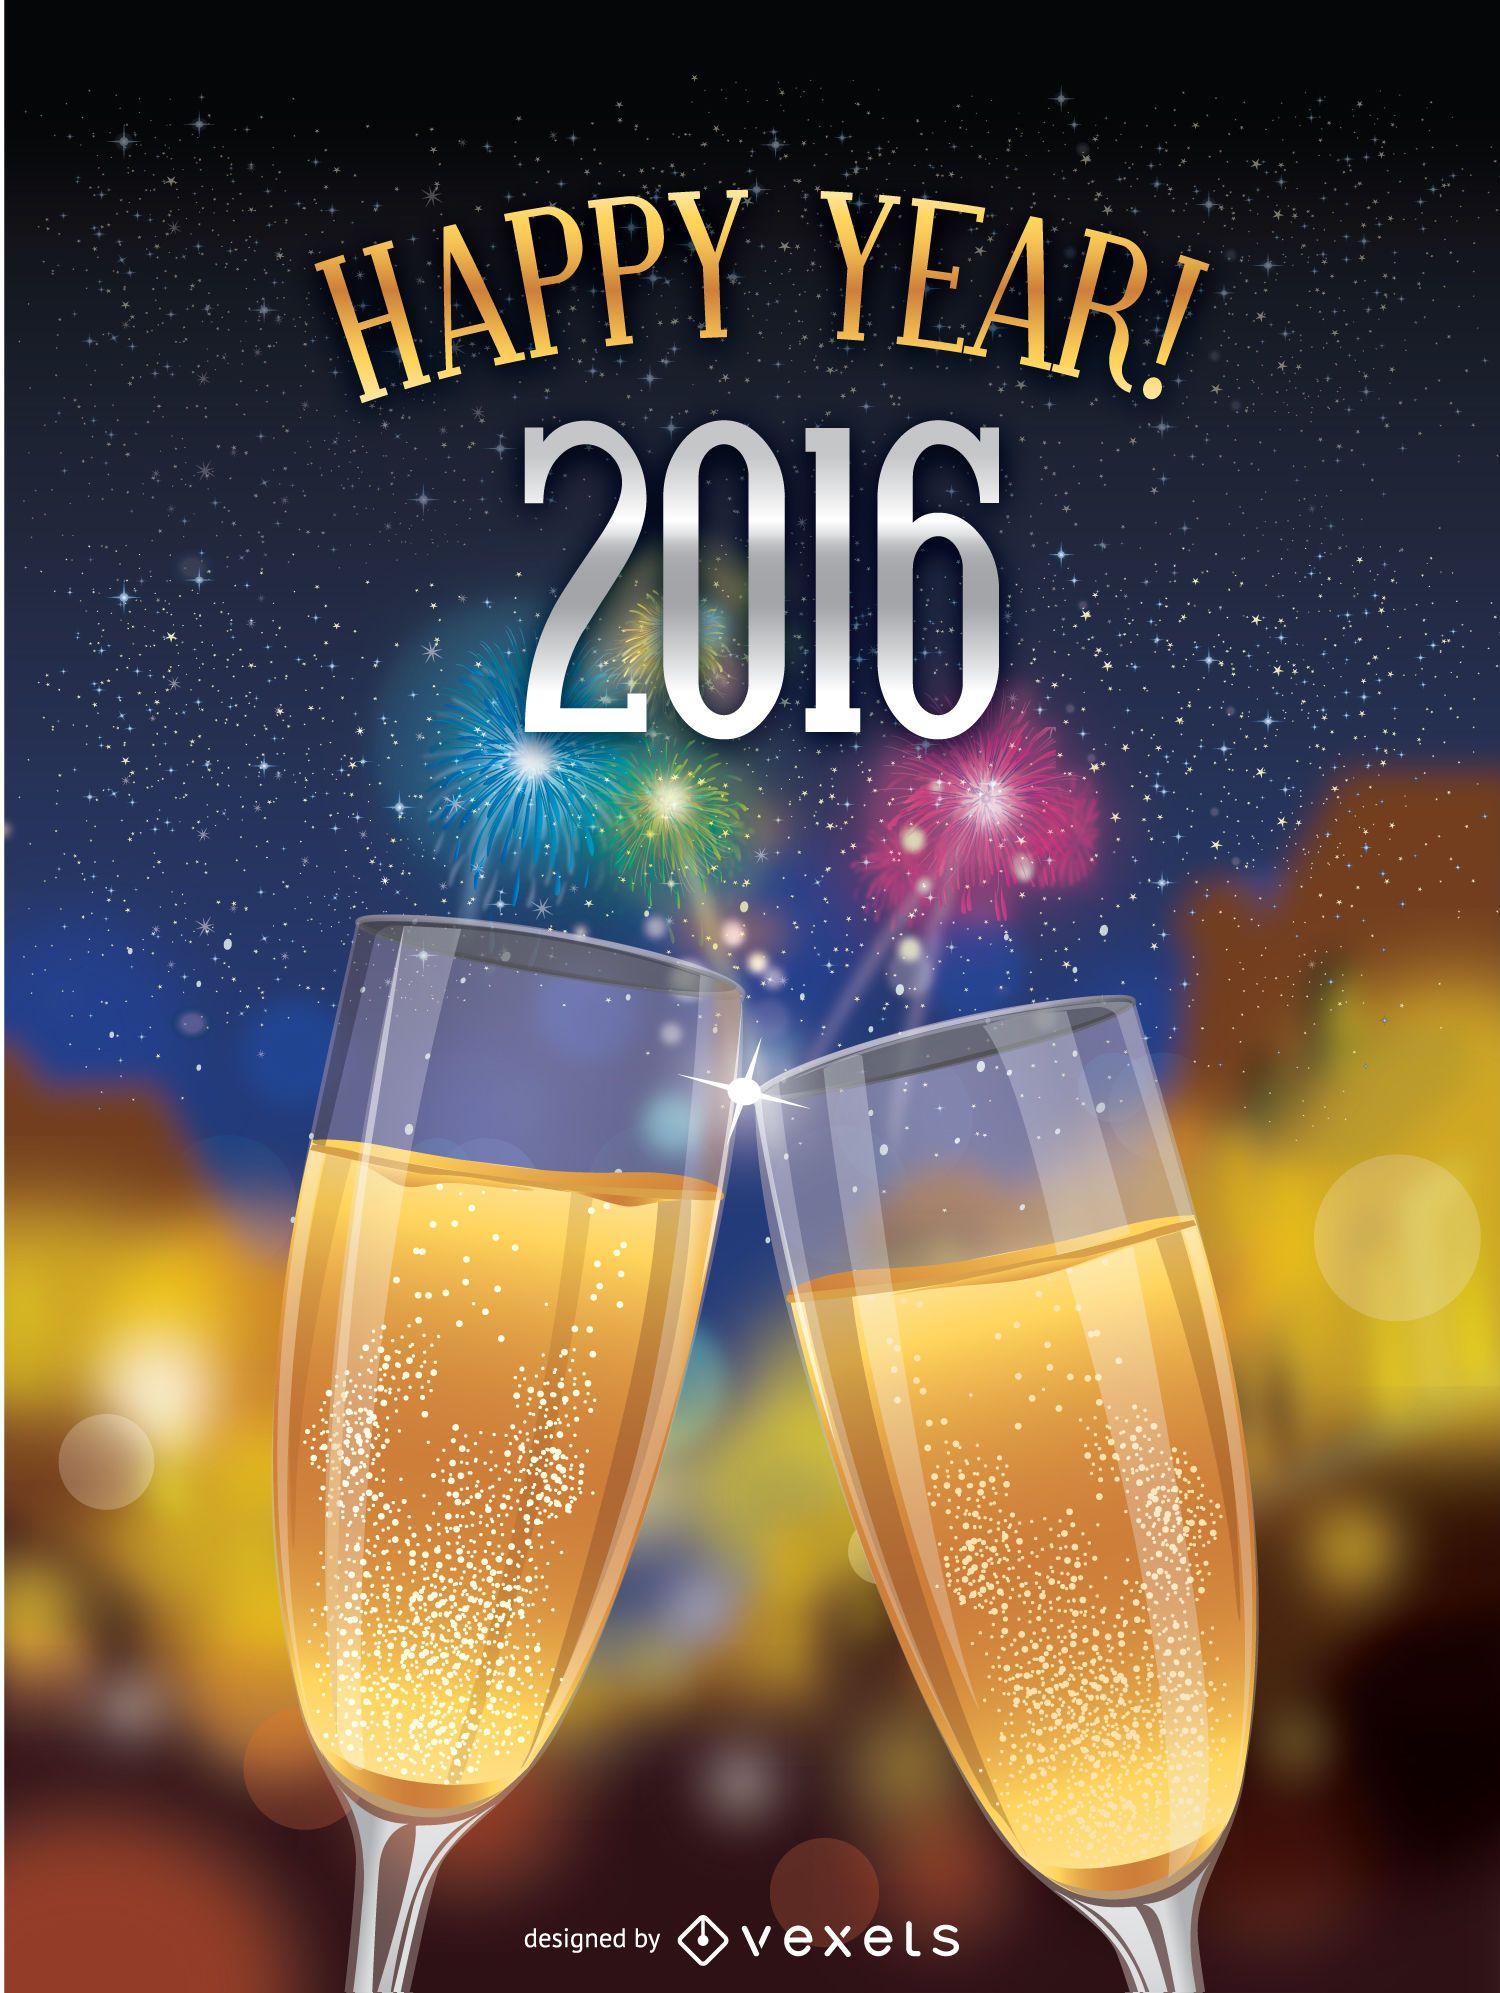 Happy 2016 toast over night sky background